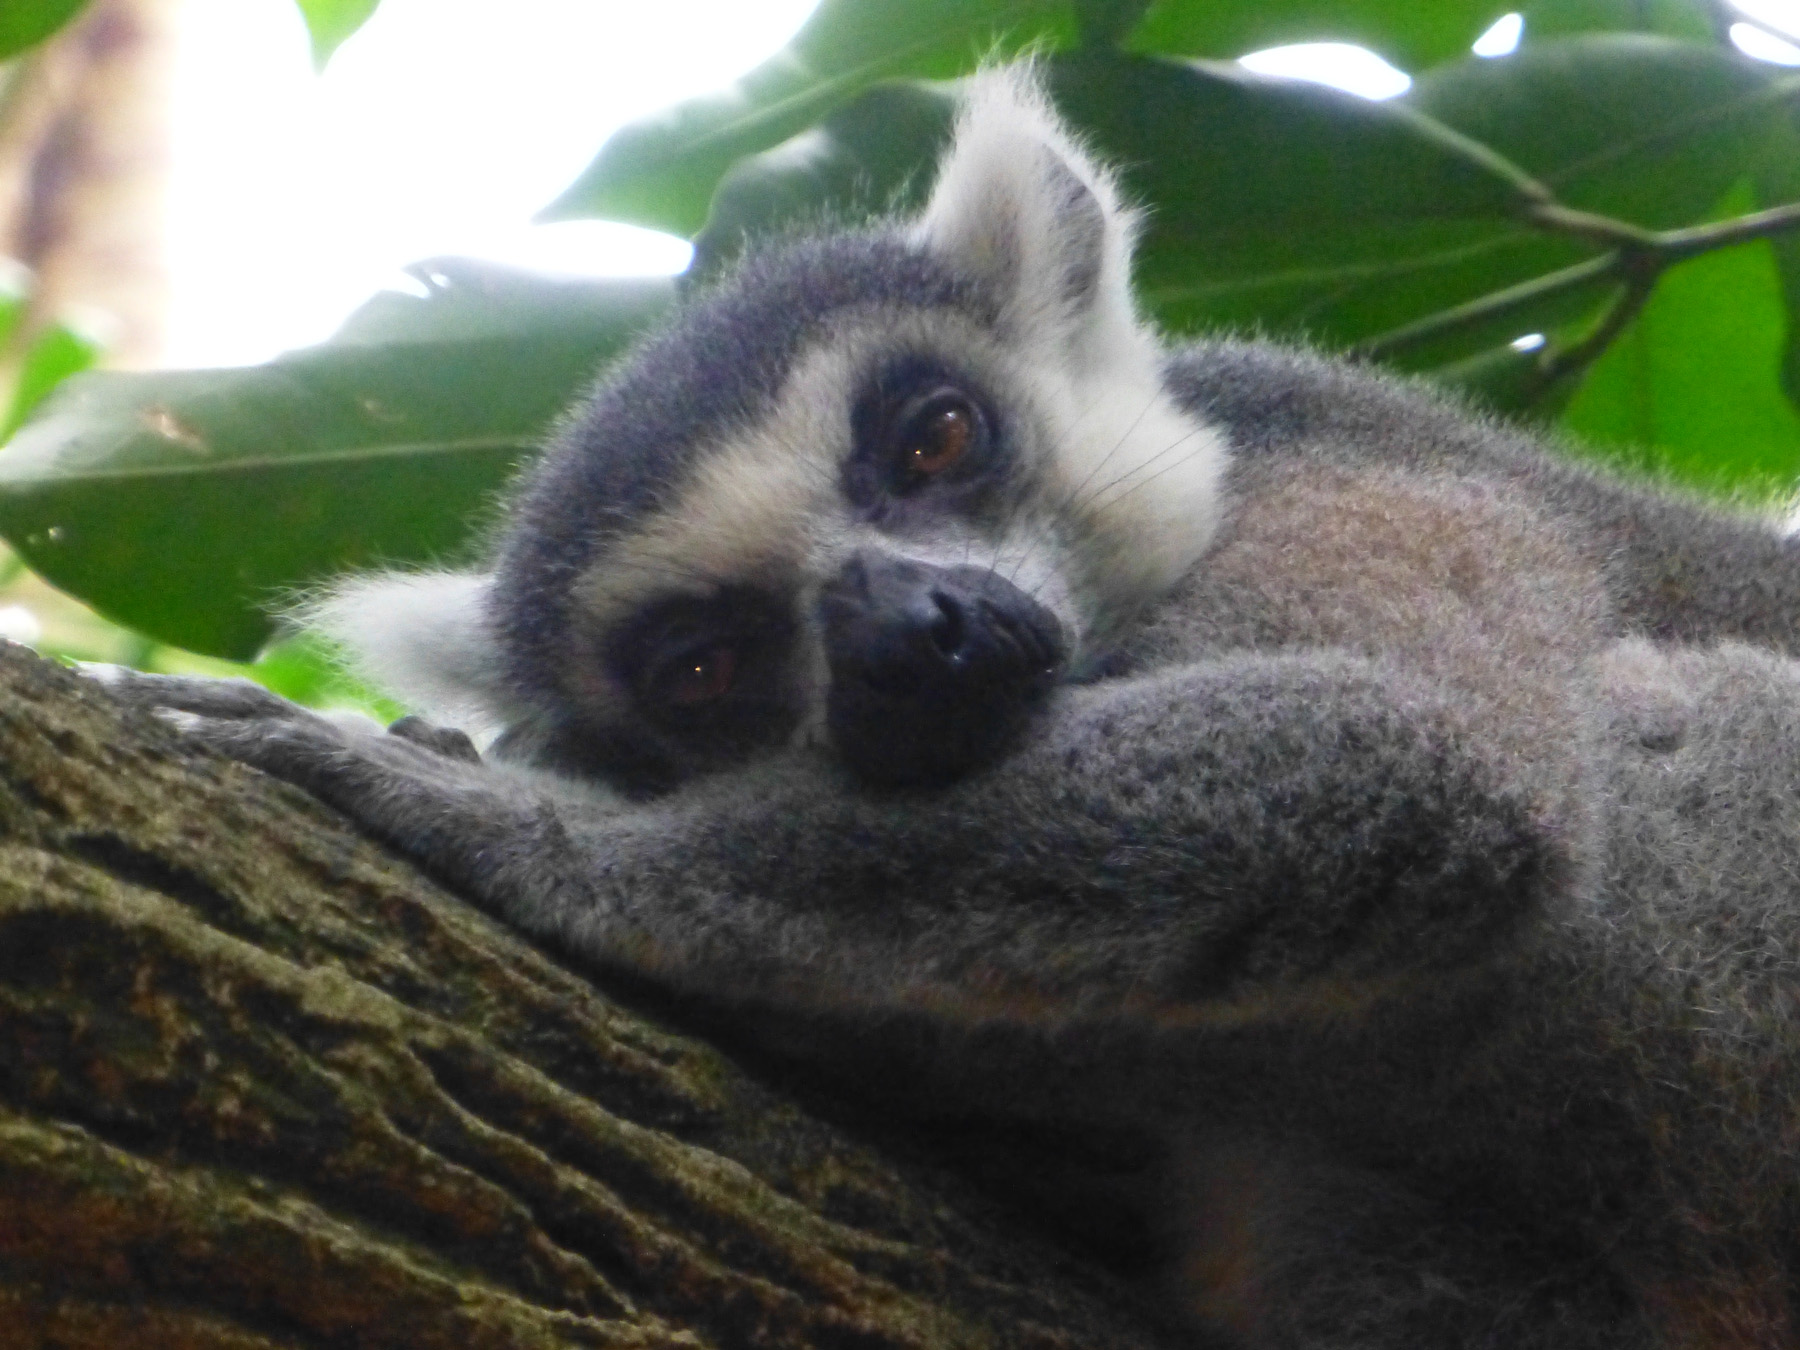 Lemur Napping